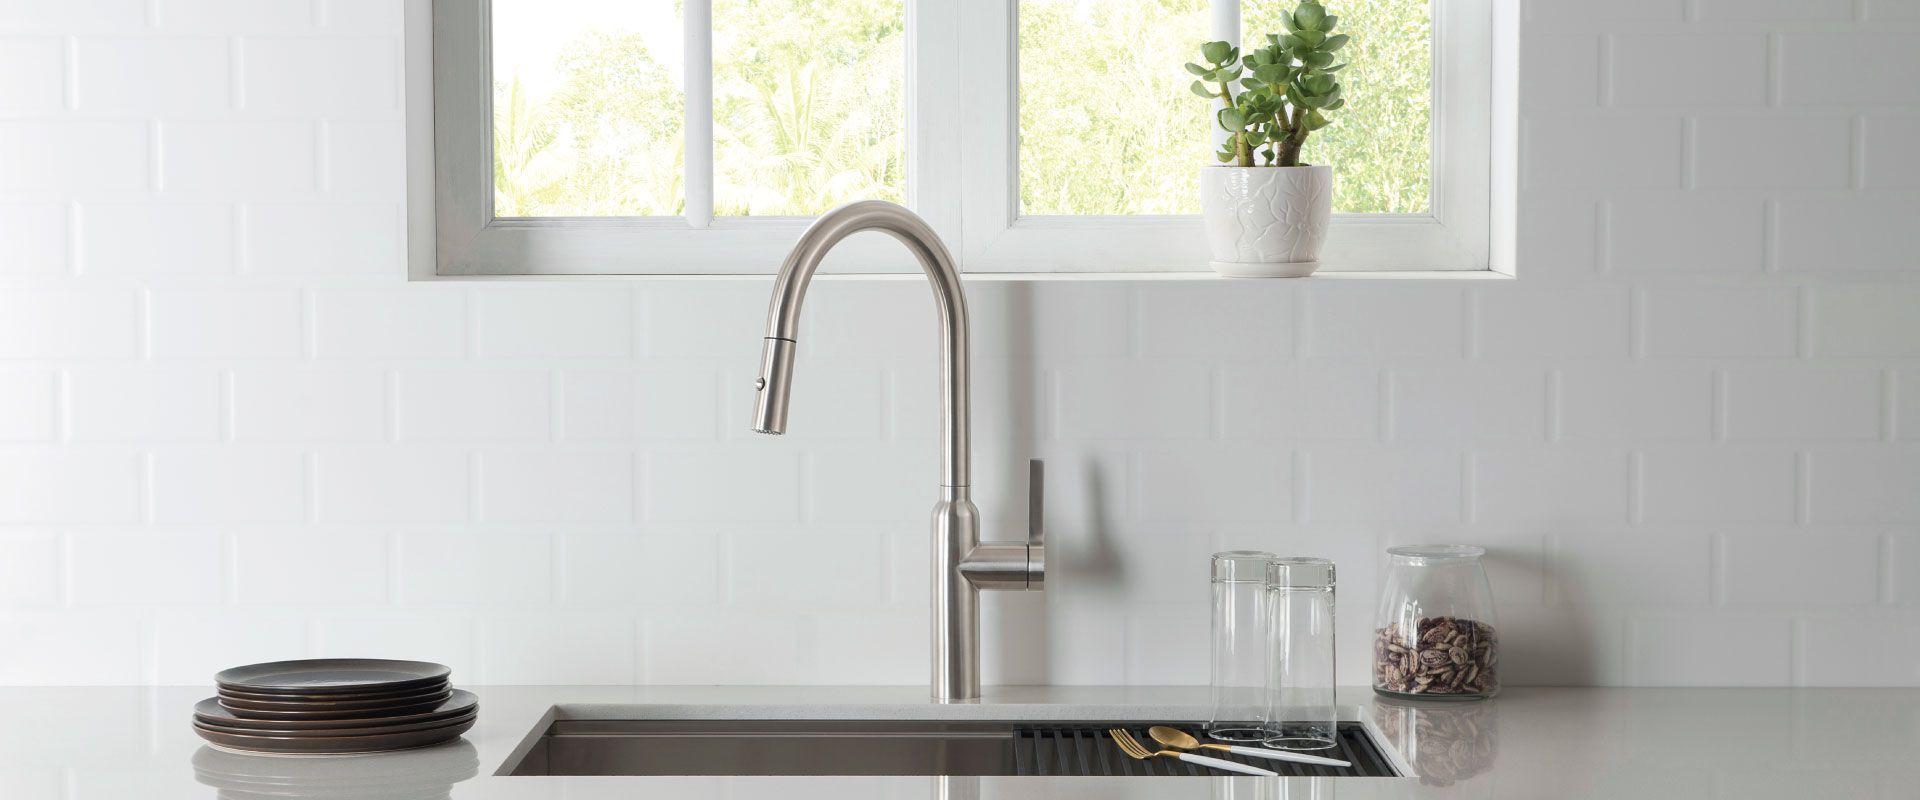 RM Living Cincinnati Modern Interior Design Faucet by Isenberg Isenberg3